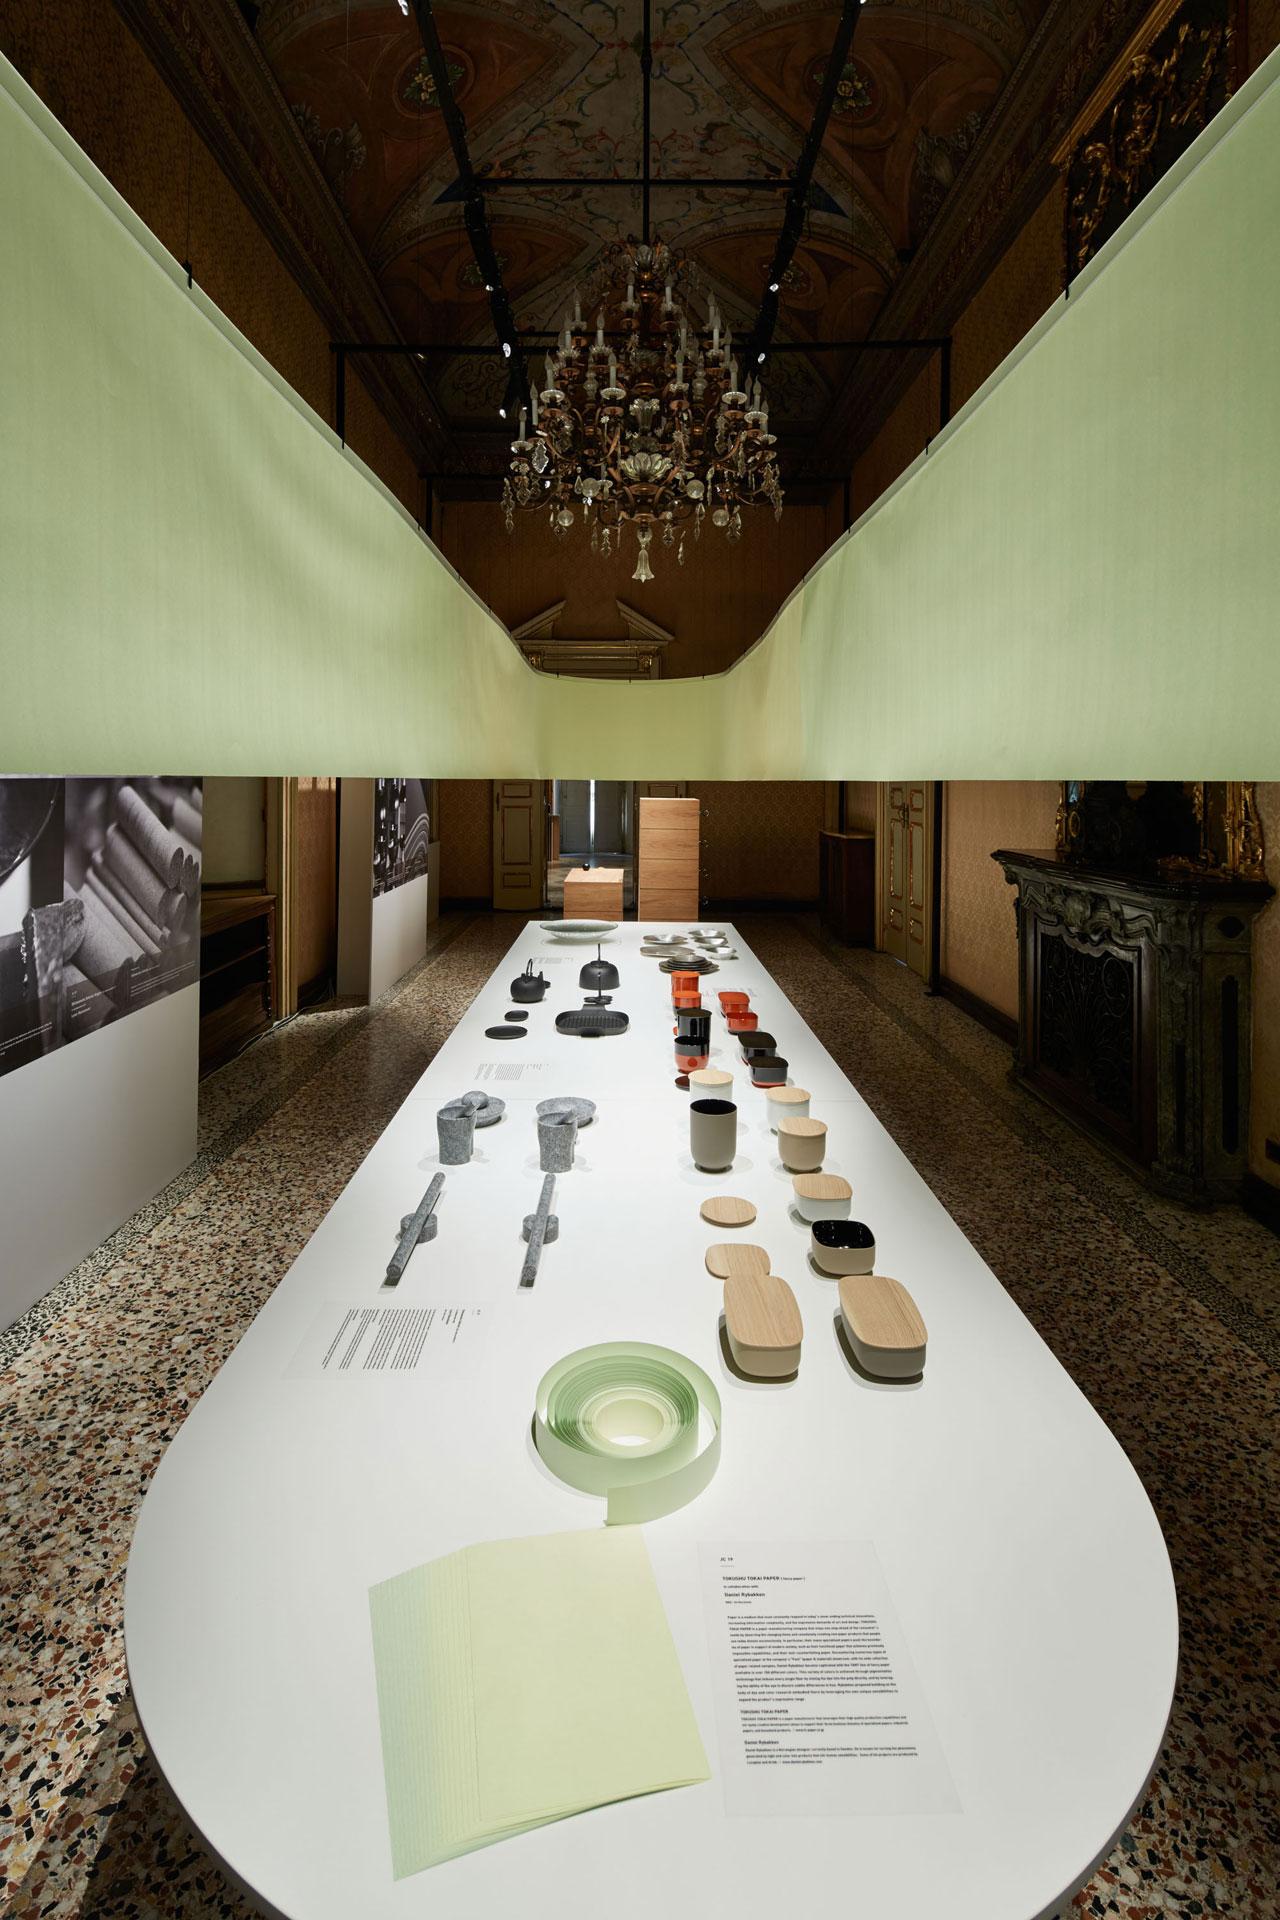 The exhibition of Japan Creativeinside Palazzo Litta during Milan Design Week 2017.